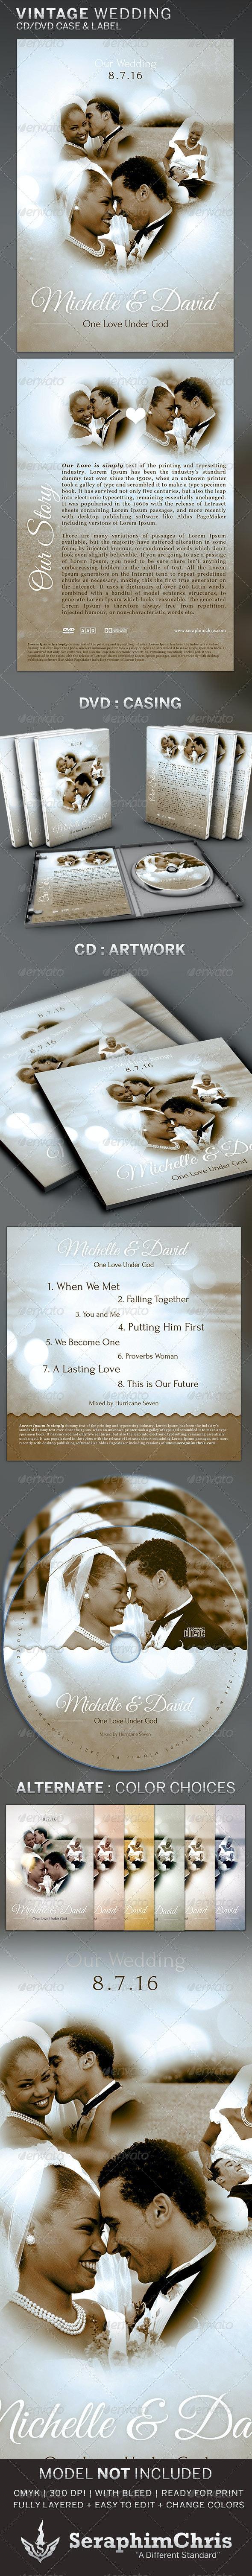 Vintage Wedding: CD/DVD Template - CD & DVD Artwork Print Templates